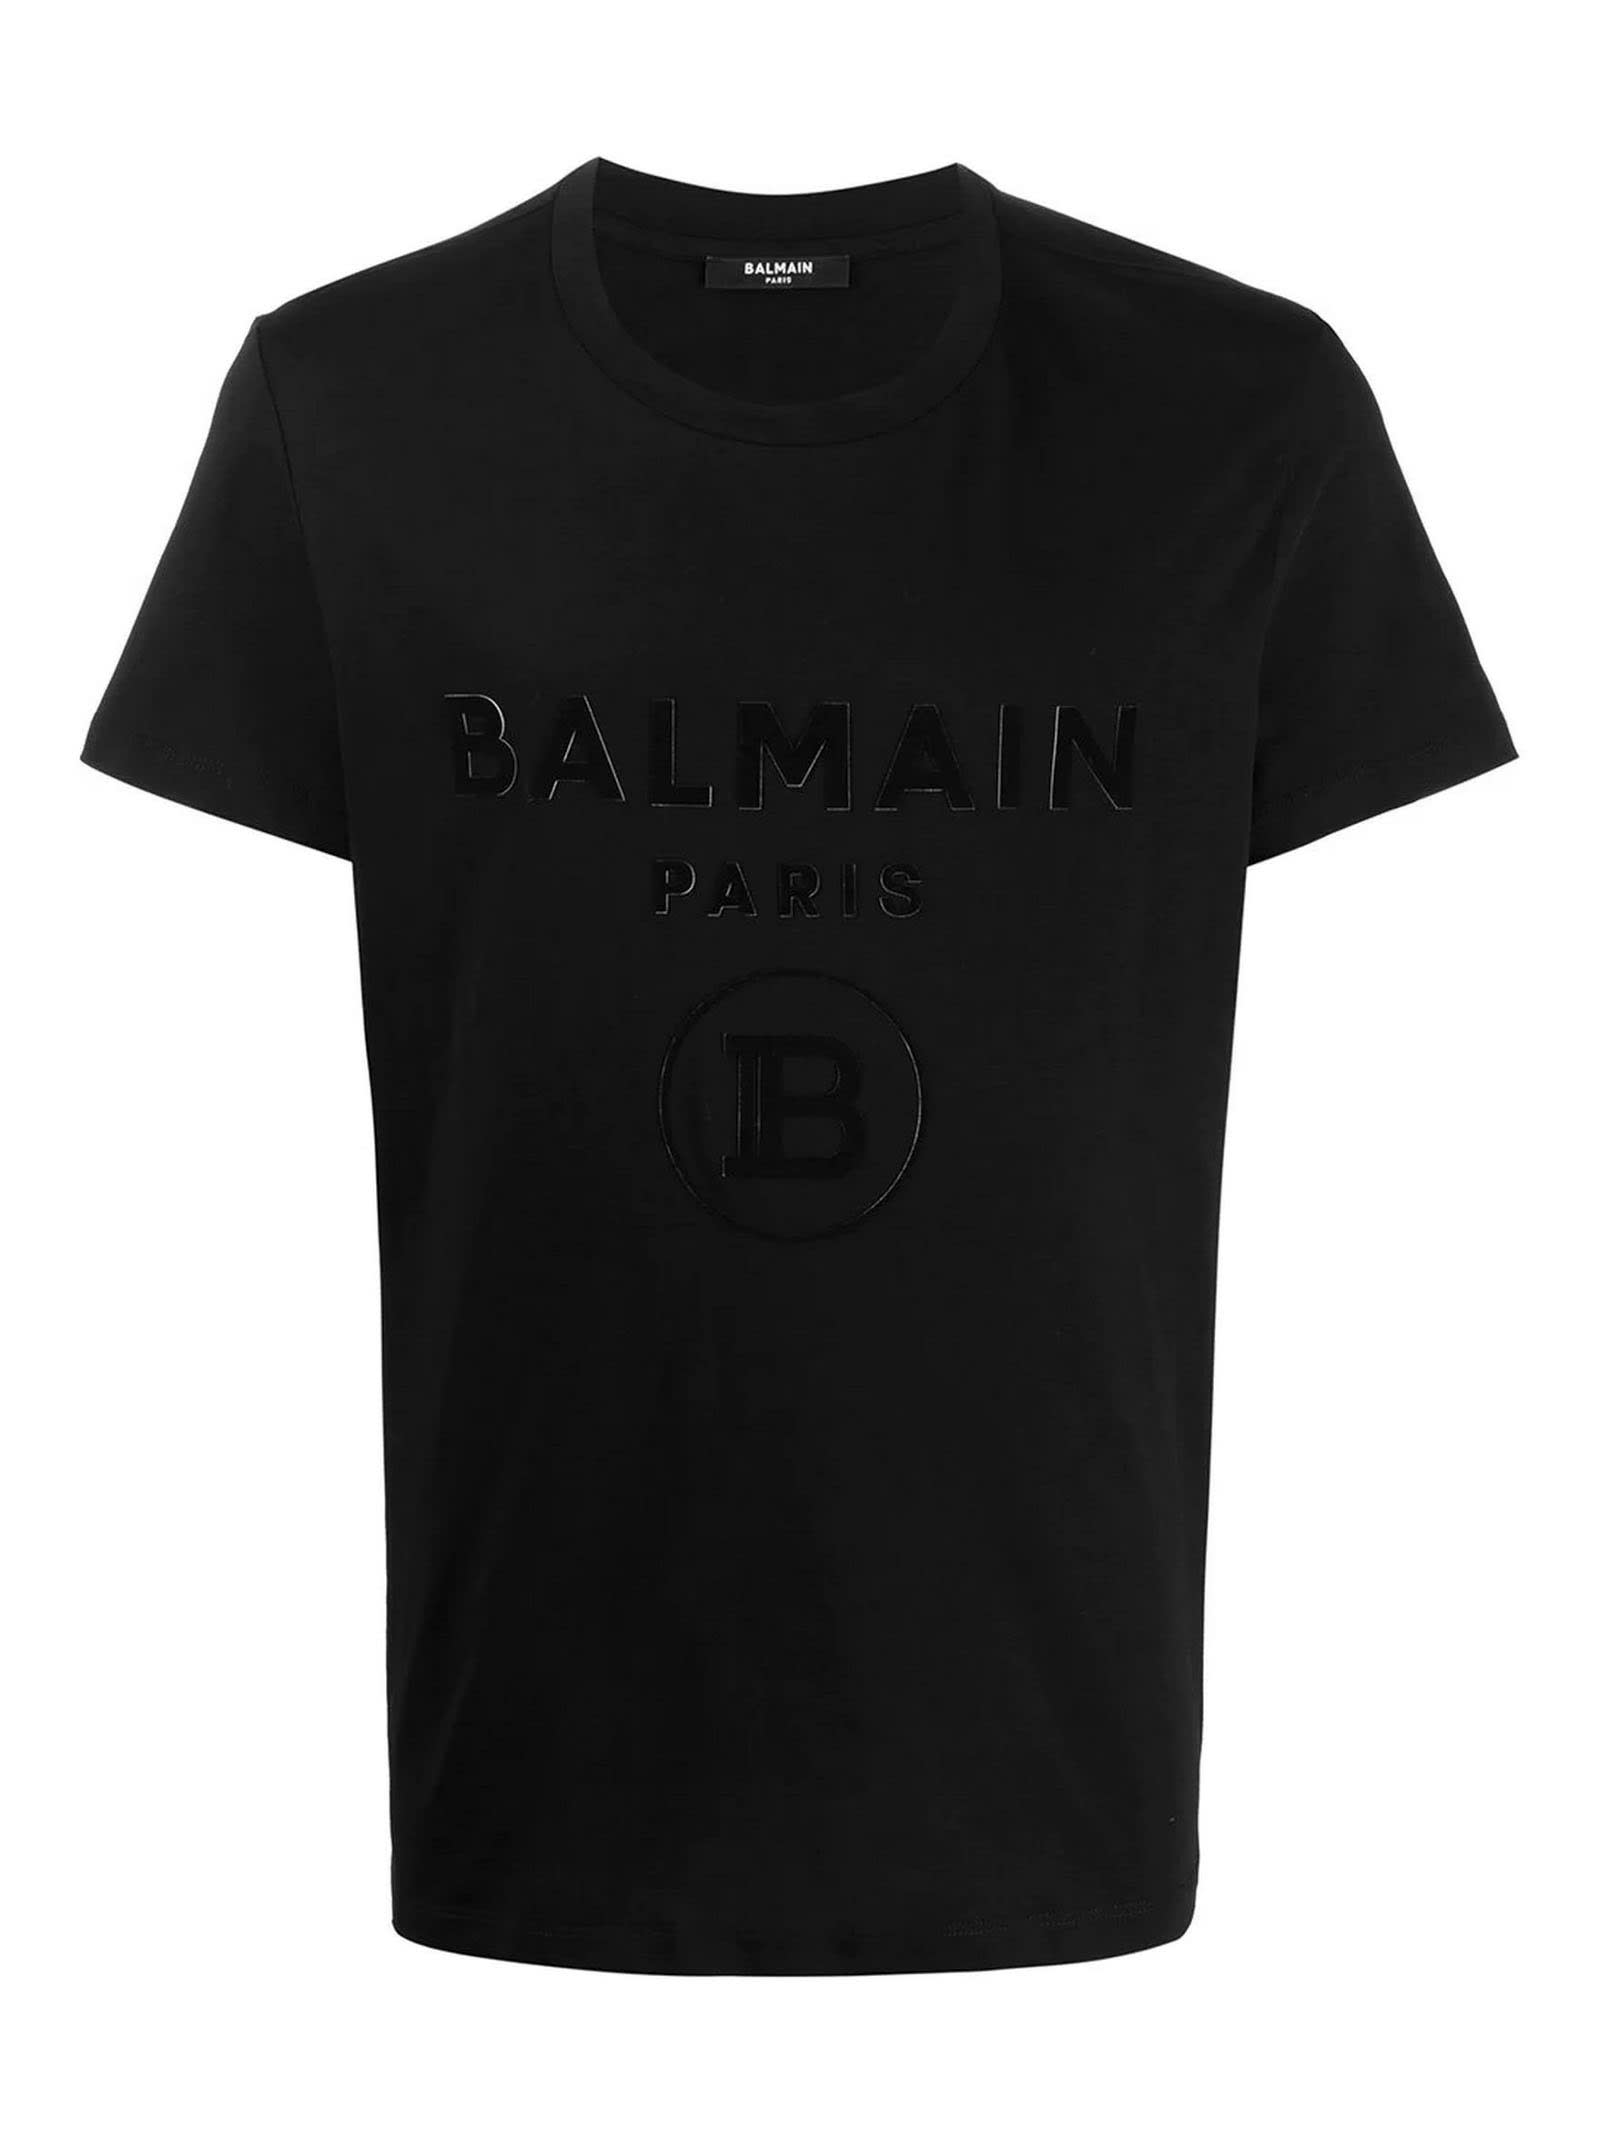 Balmain Cottons BLACK COTTON T-SHIRT